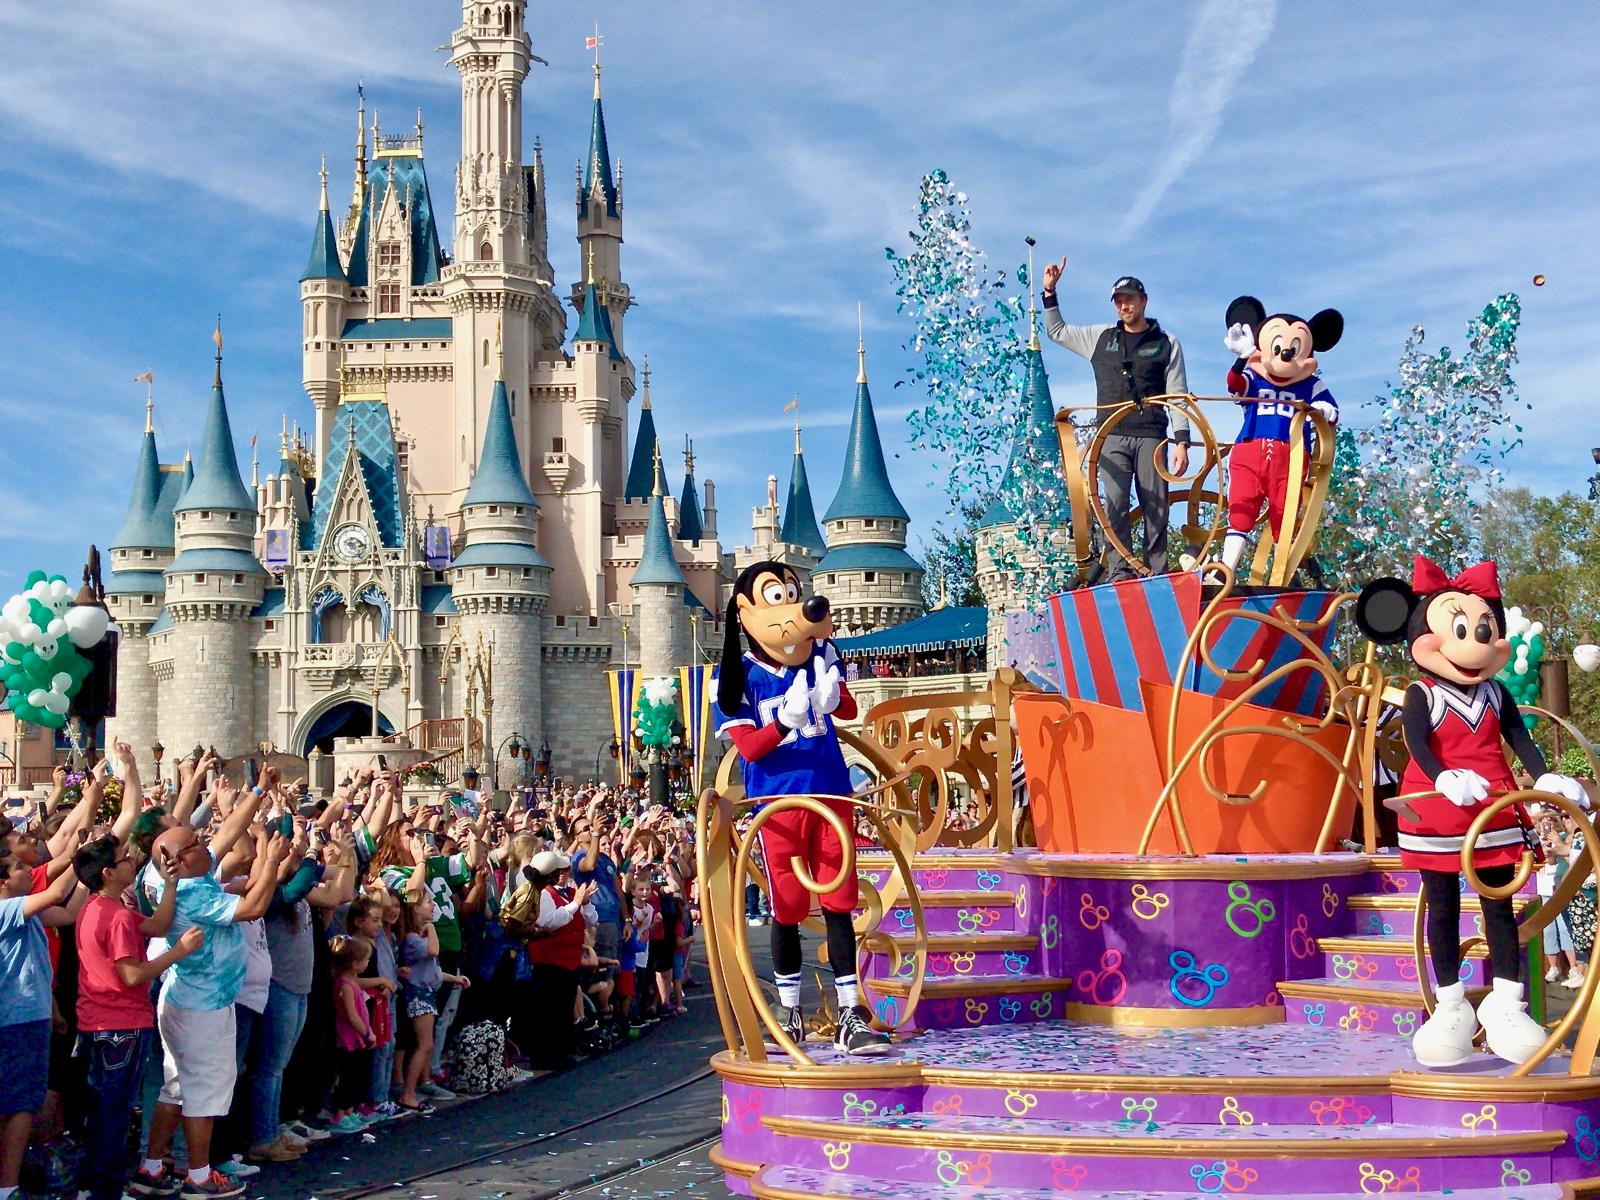 Welcome To Wdwnewscom! Home Of Everything Walt Disney - HD1600×1200